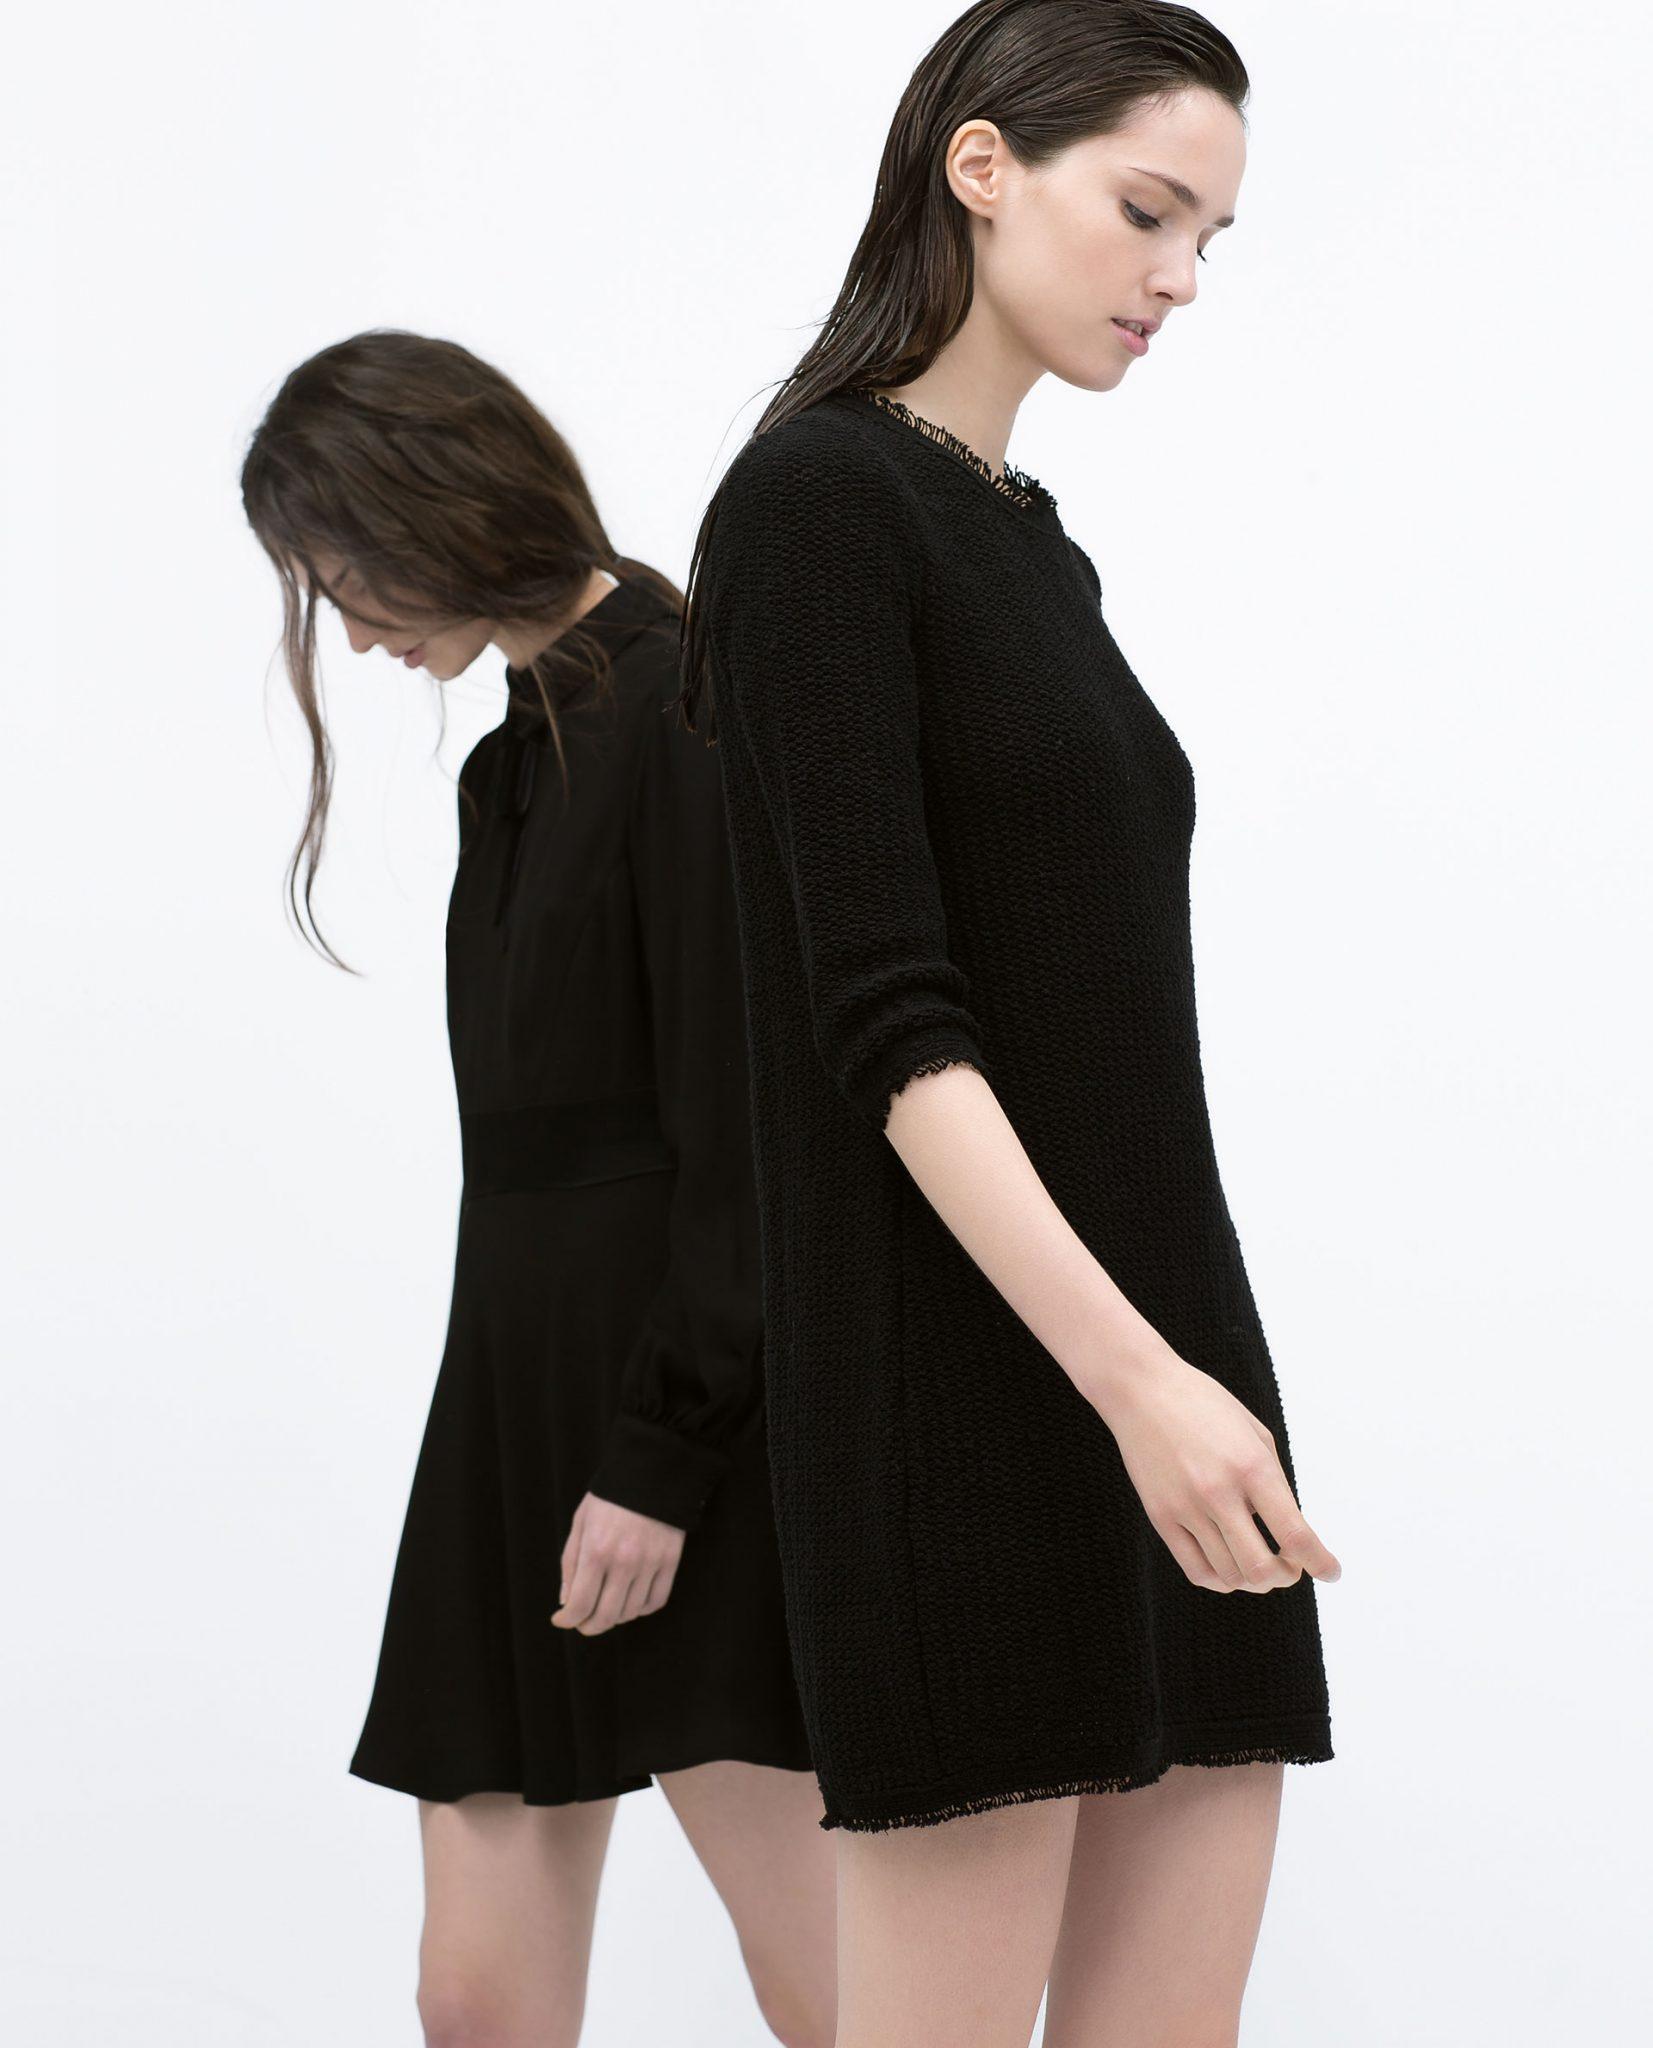 zara_dress